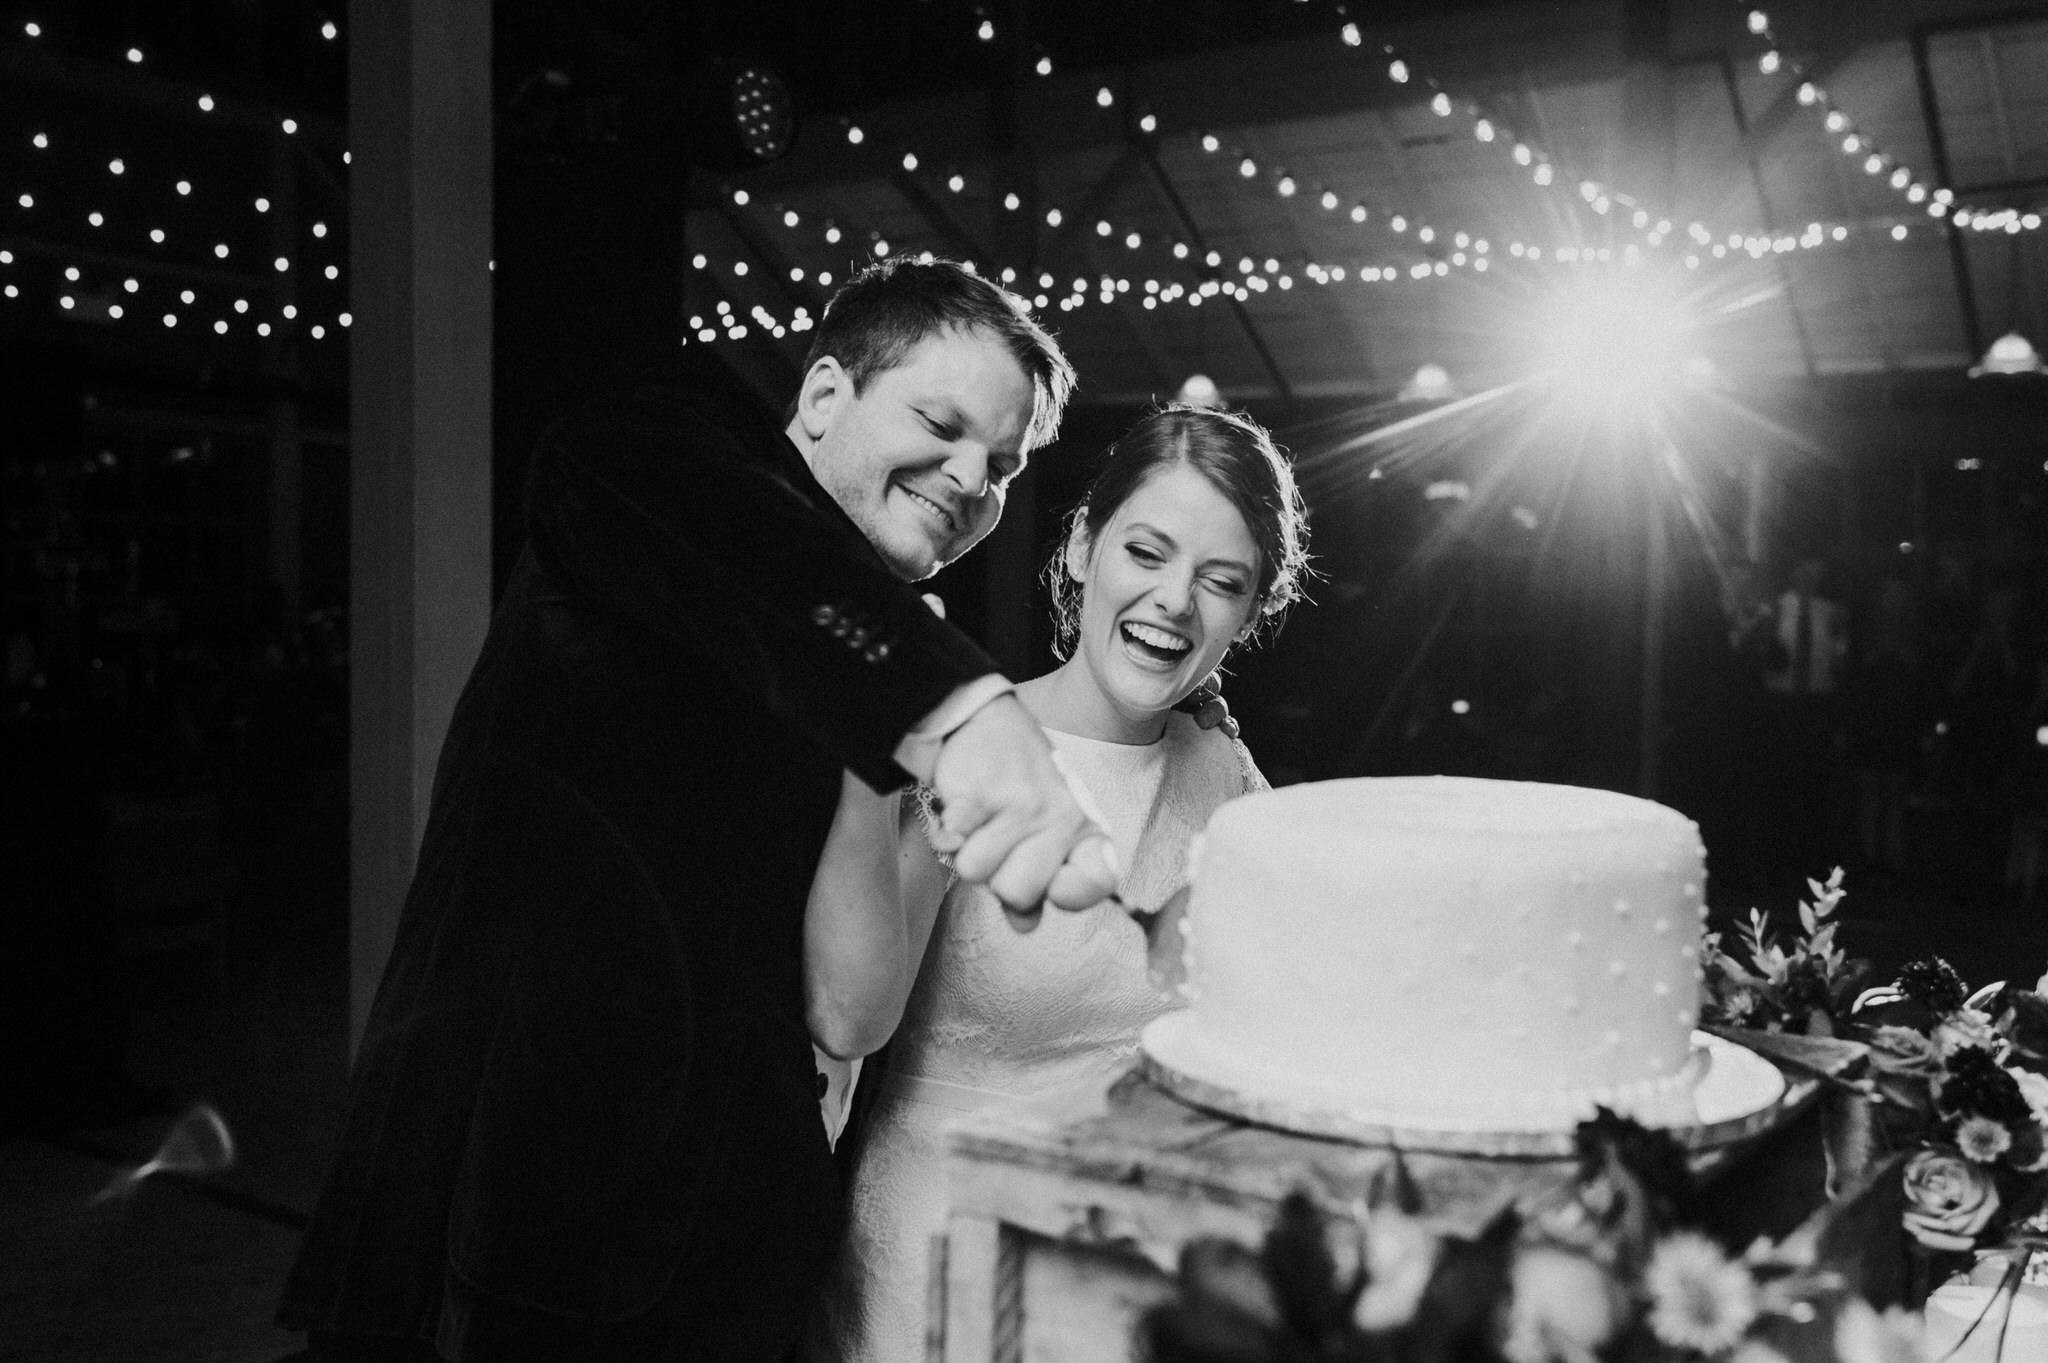 scarletoneillphotography_weddingphotography_prince edward county weddings164.JPG